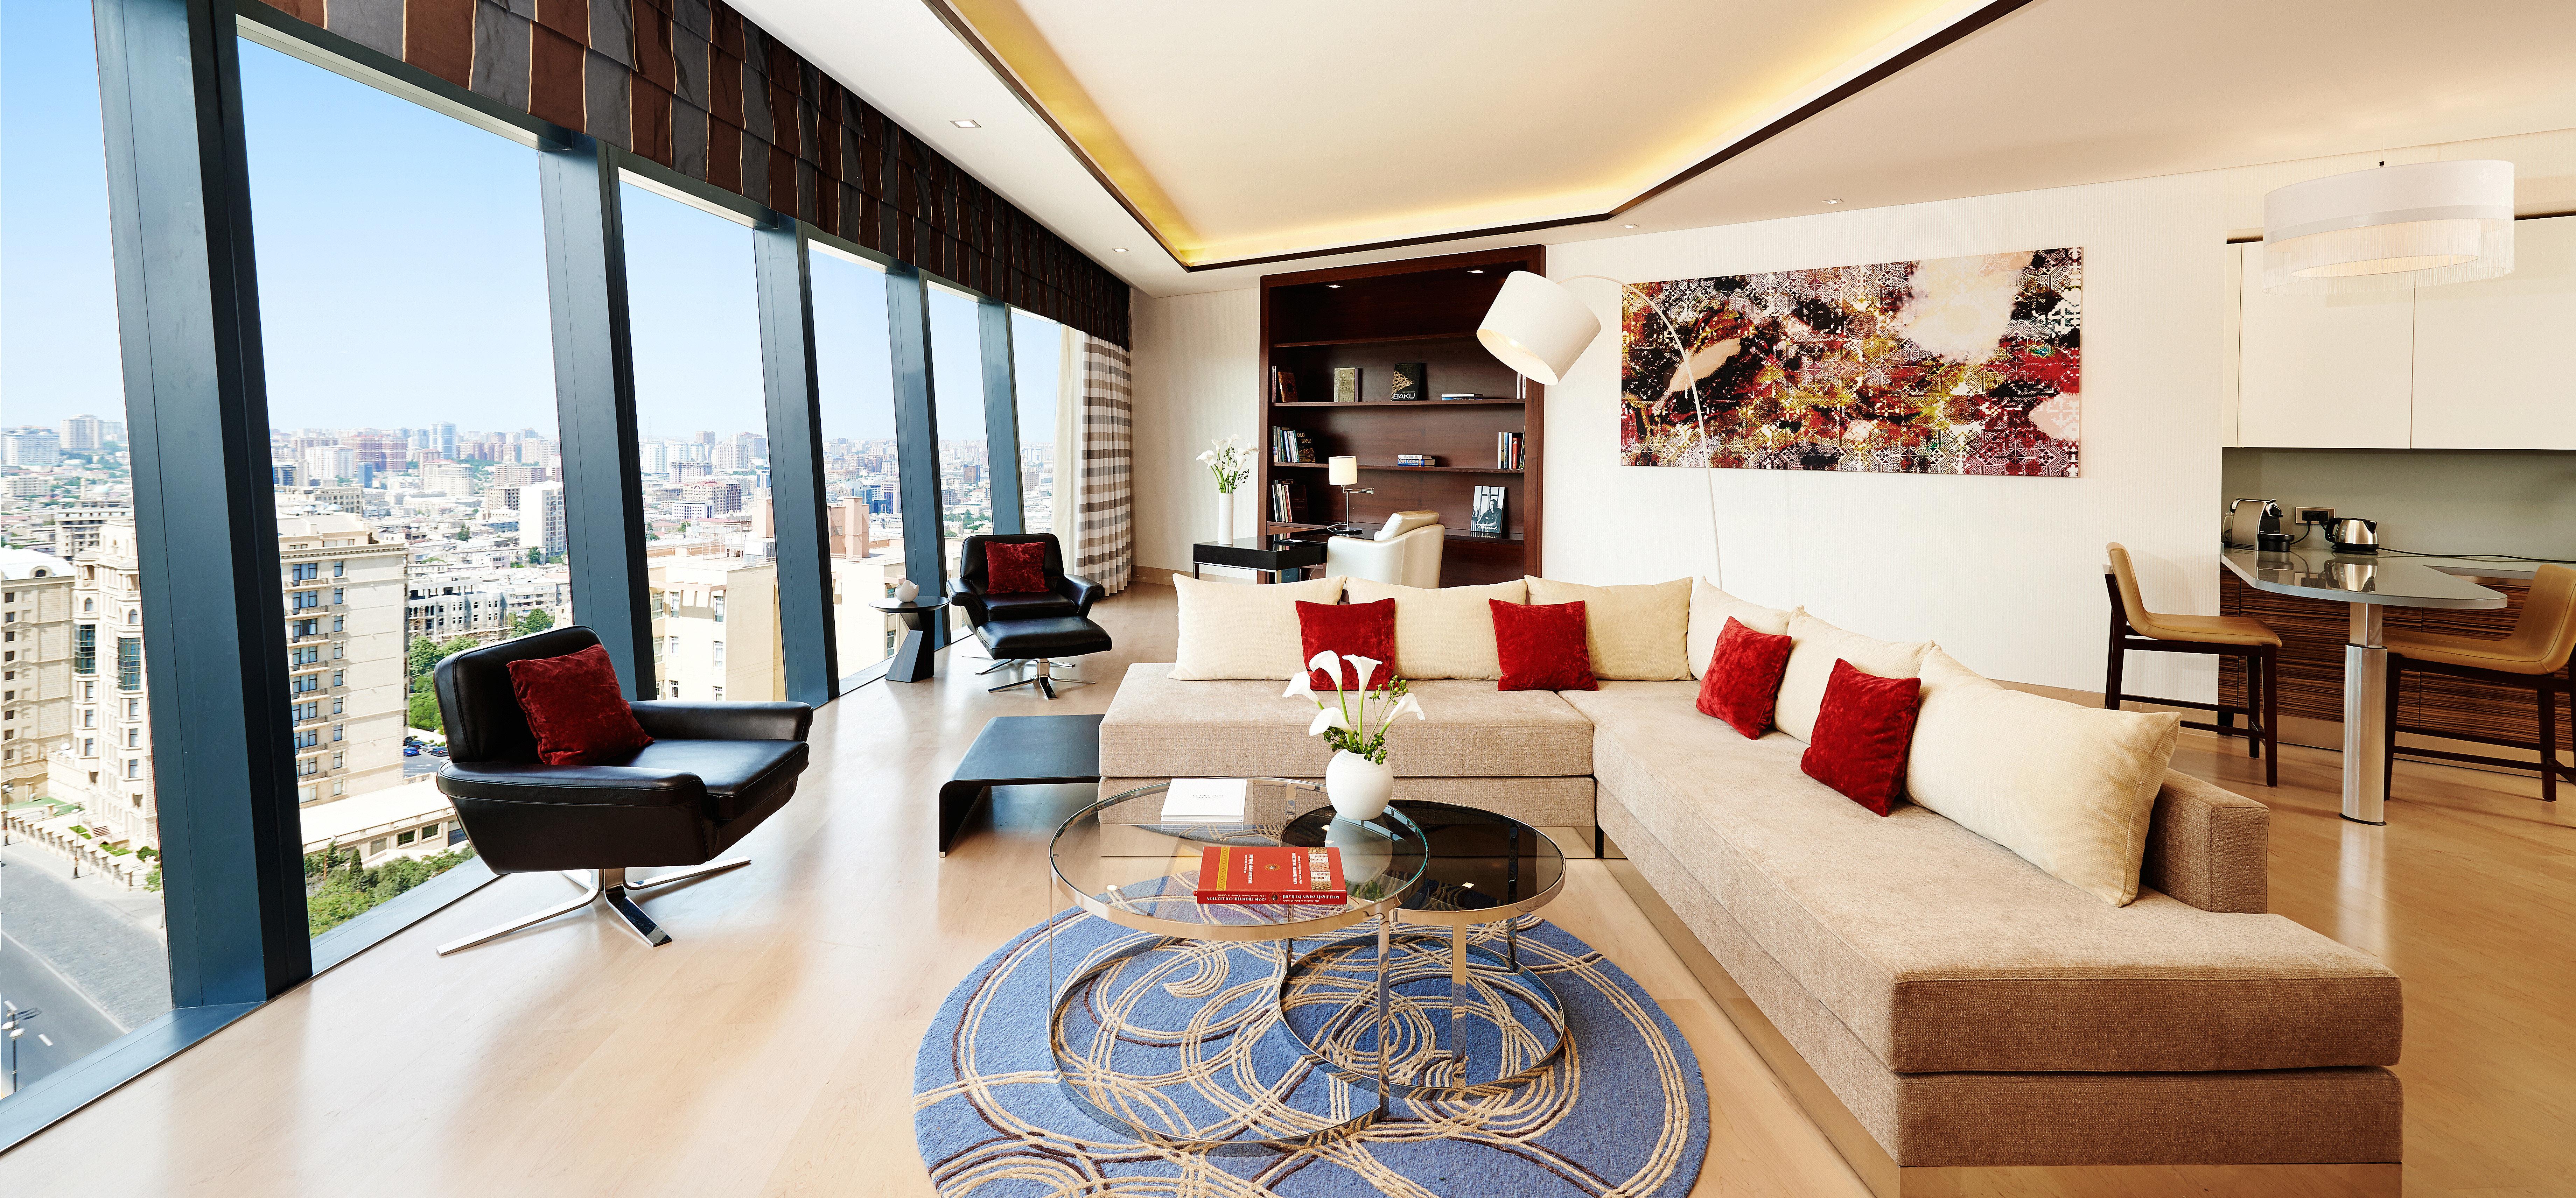 Hip Lounge Luxury Modern Scenic views property living room home condominium Suite Lobby Resort nice Villa